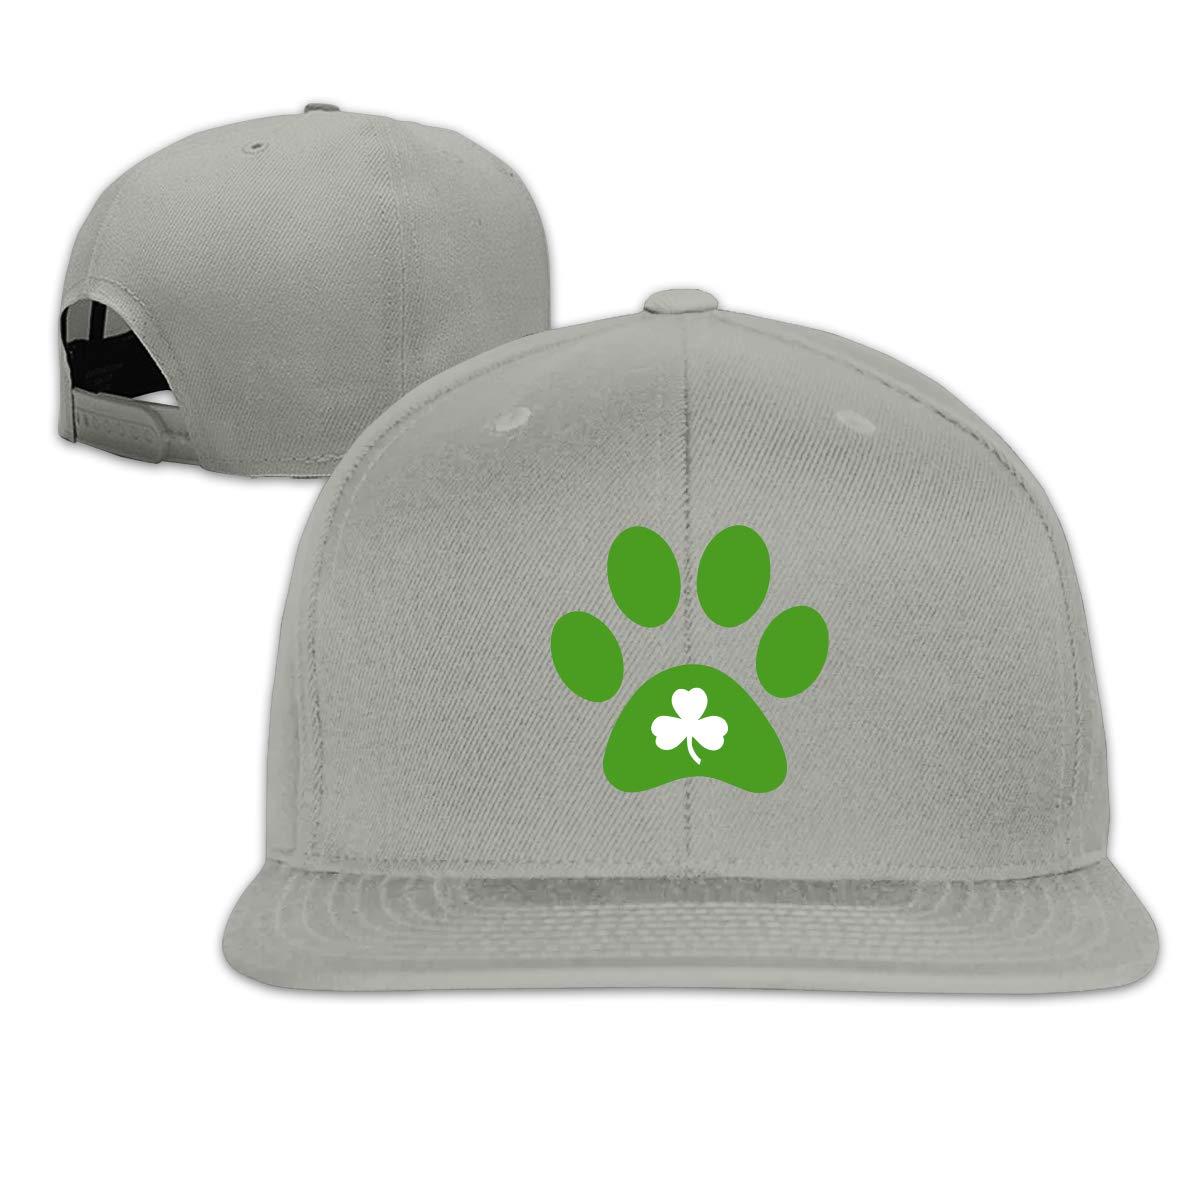 MOCSTONE Unisex Snapback Hat Paw Print Clover Adjustable Baseball Cap